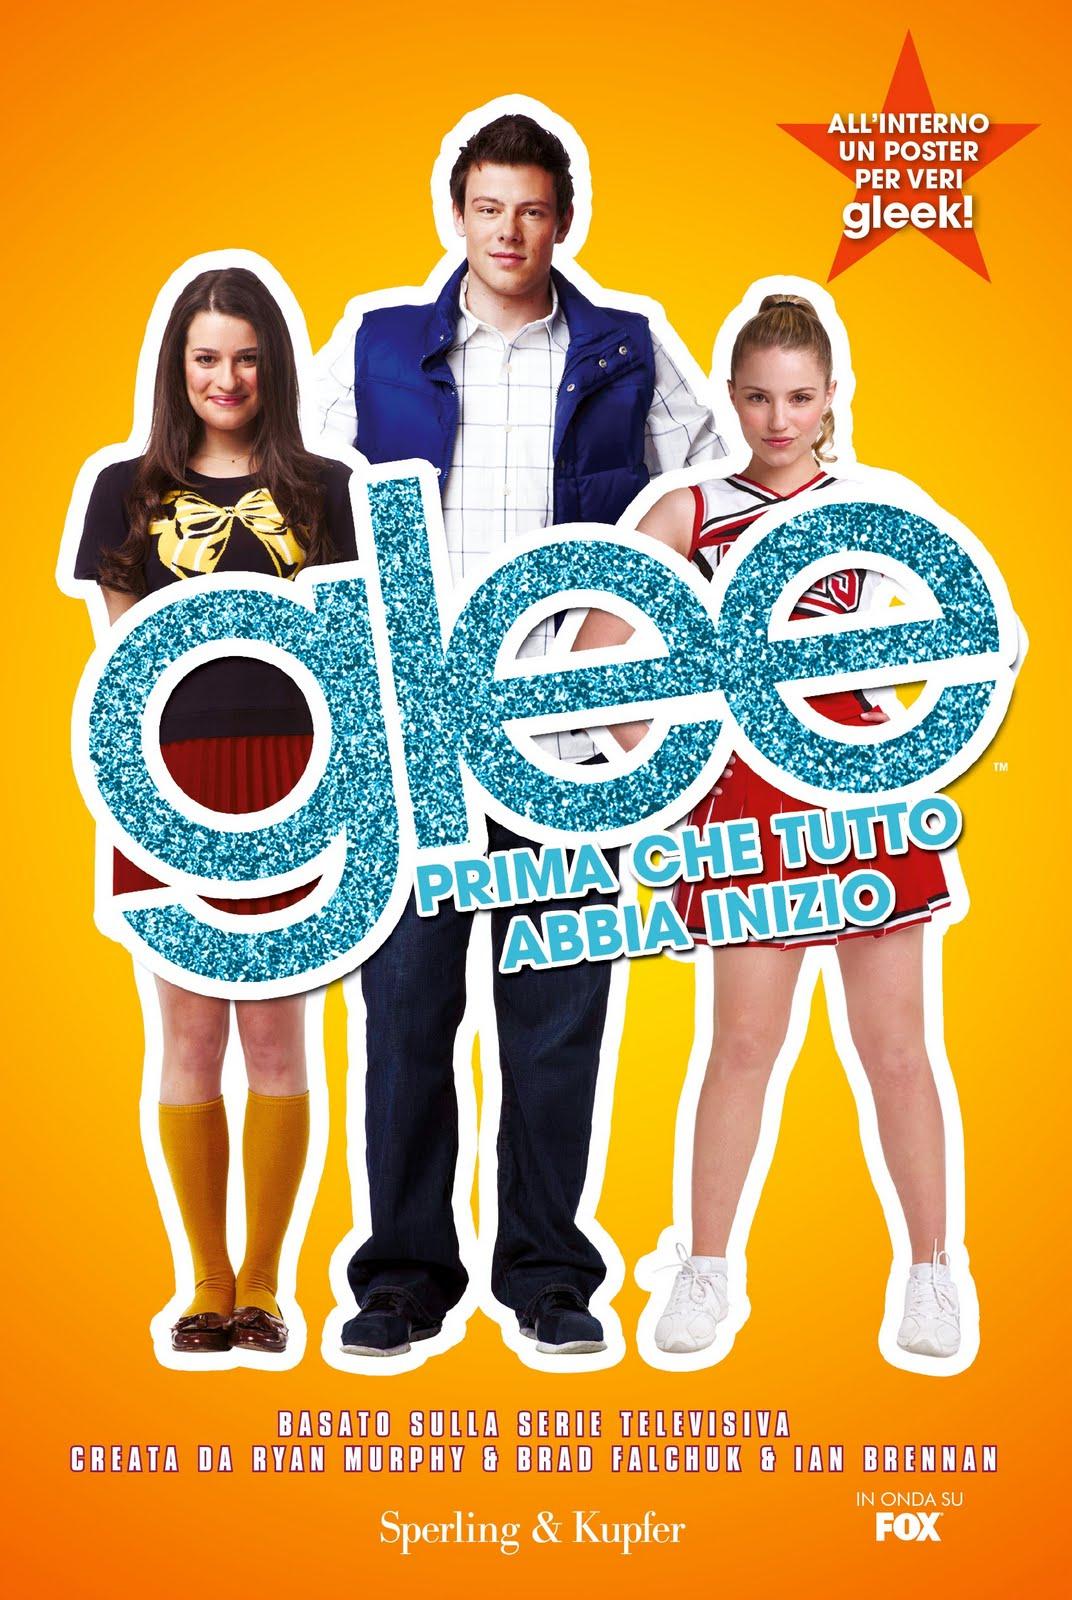 Glee Cory Monteith datazione